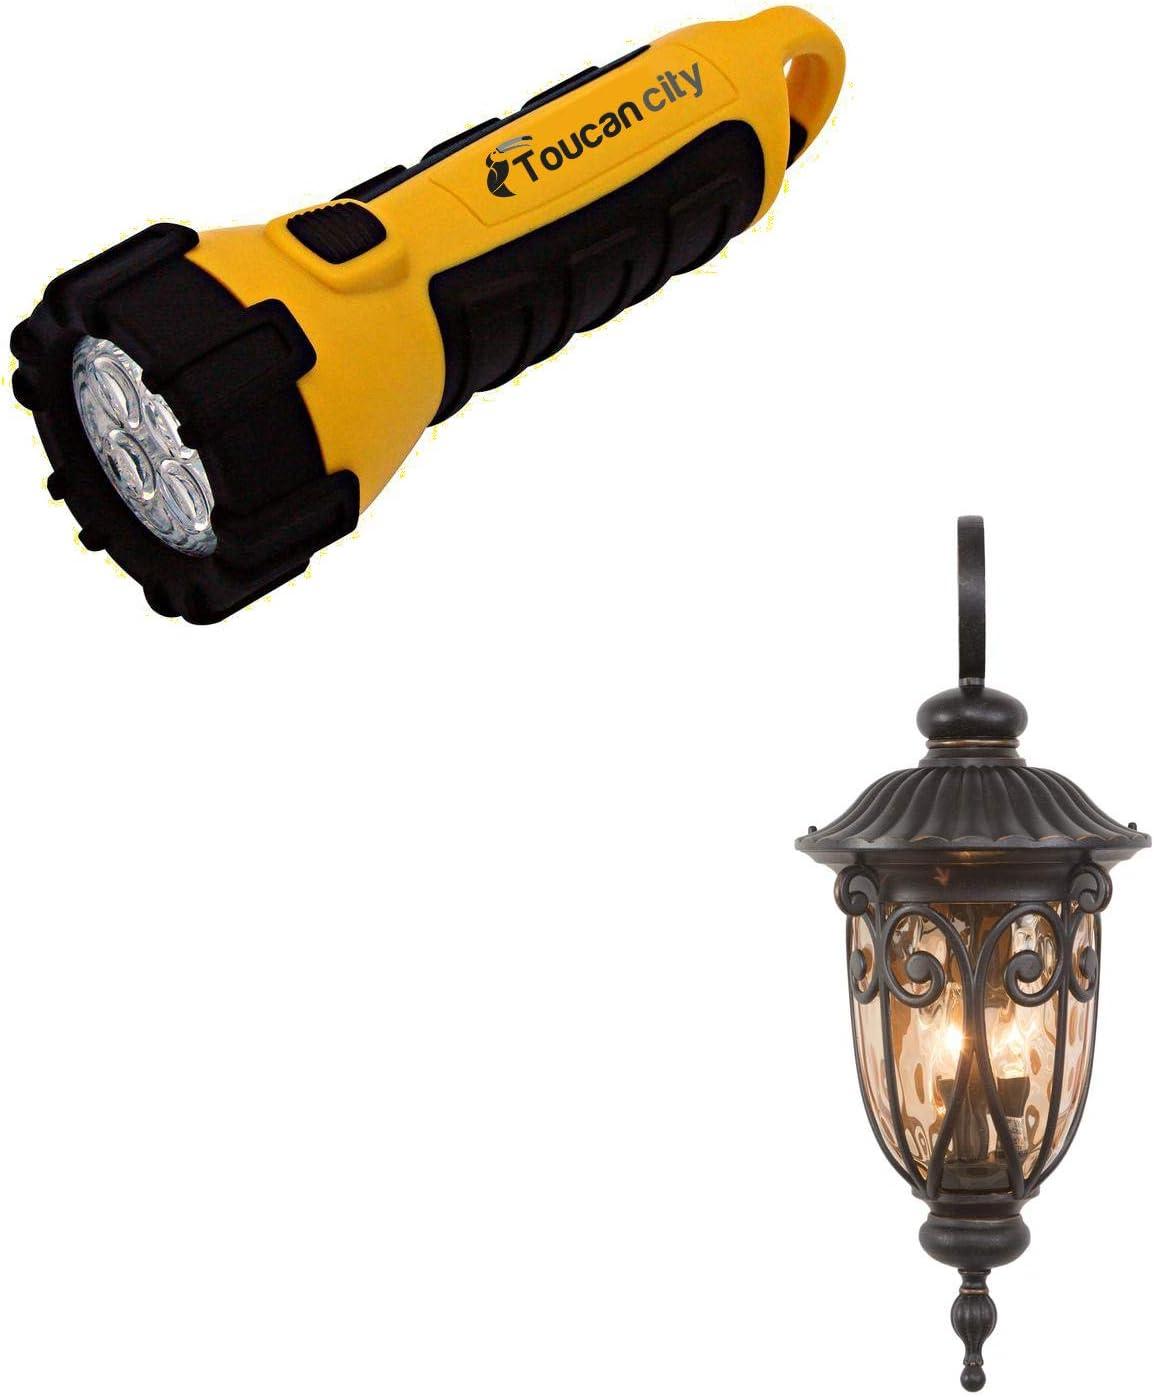 Toucan City LED Flashlight and Yosemite Home Decor Viviana Collection 3-Light Oil Rubbed Bronze Outdoor Wall Lantern Sconce 519LDIORB